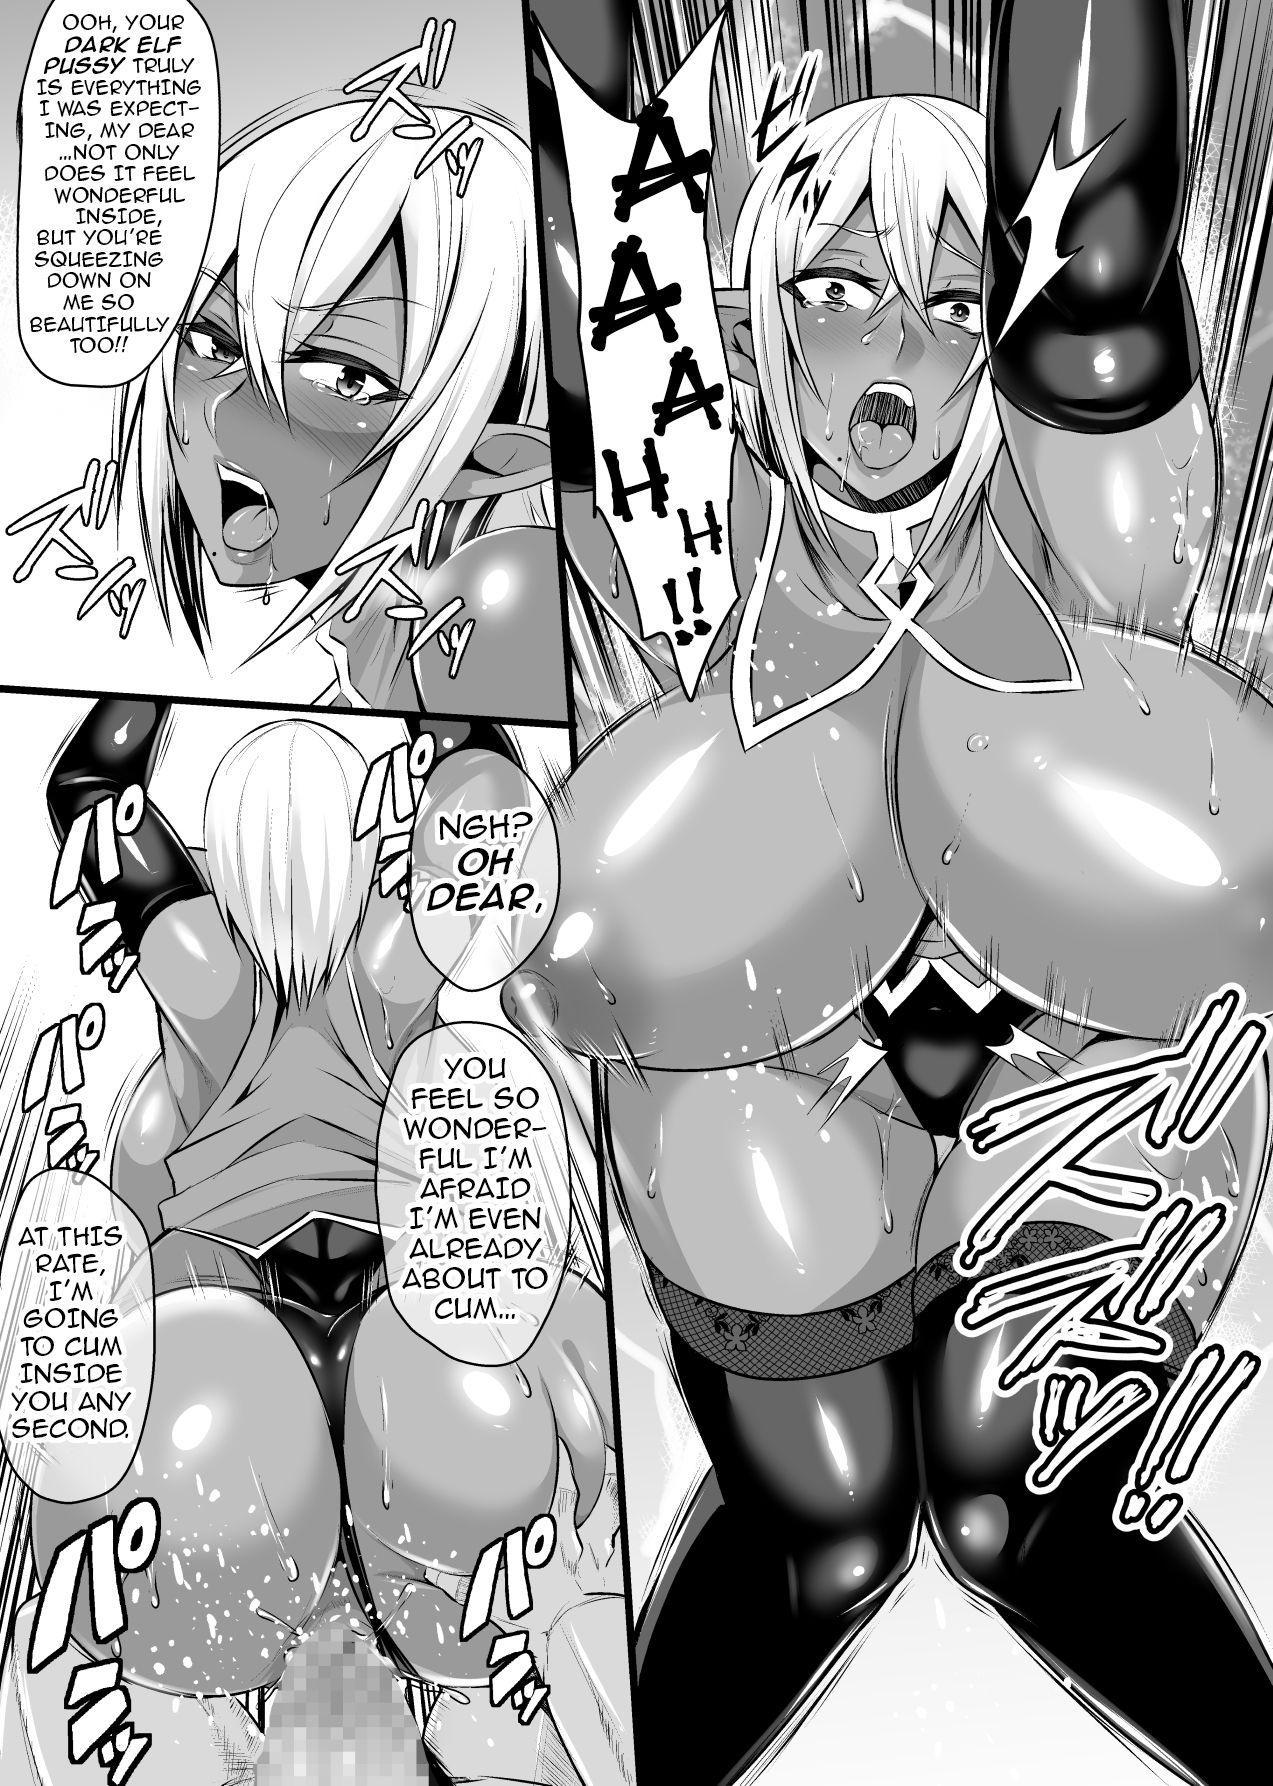 Onna Shougun Artesia - Dark Elf Haramase Choukyou Kiroku 7